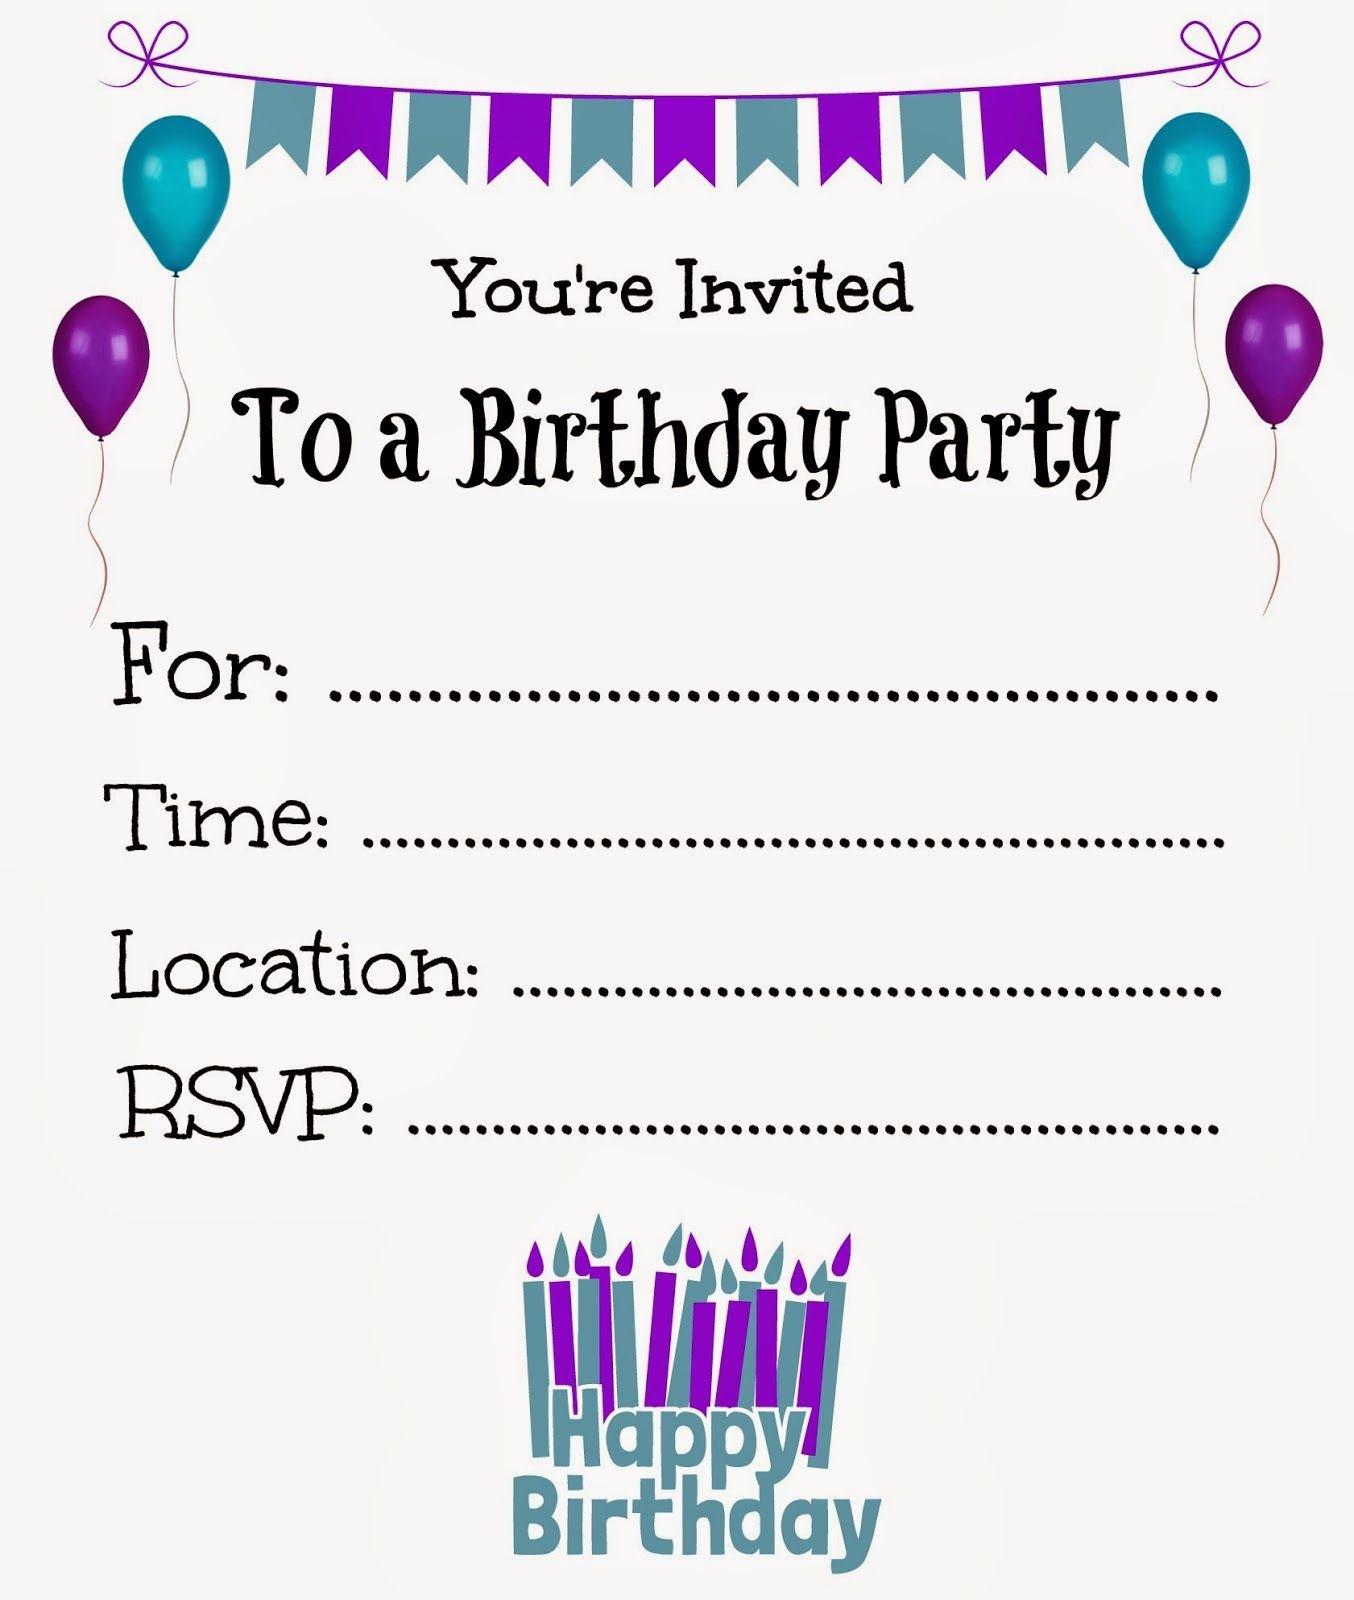 Free Printable Birthday Invitations For Kids #freeprintables - Free Printable Birthday Invitations